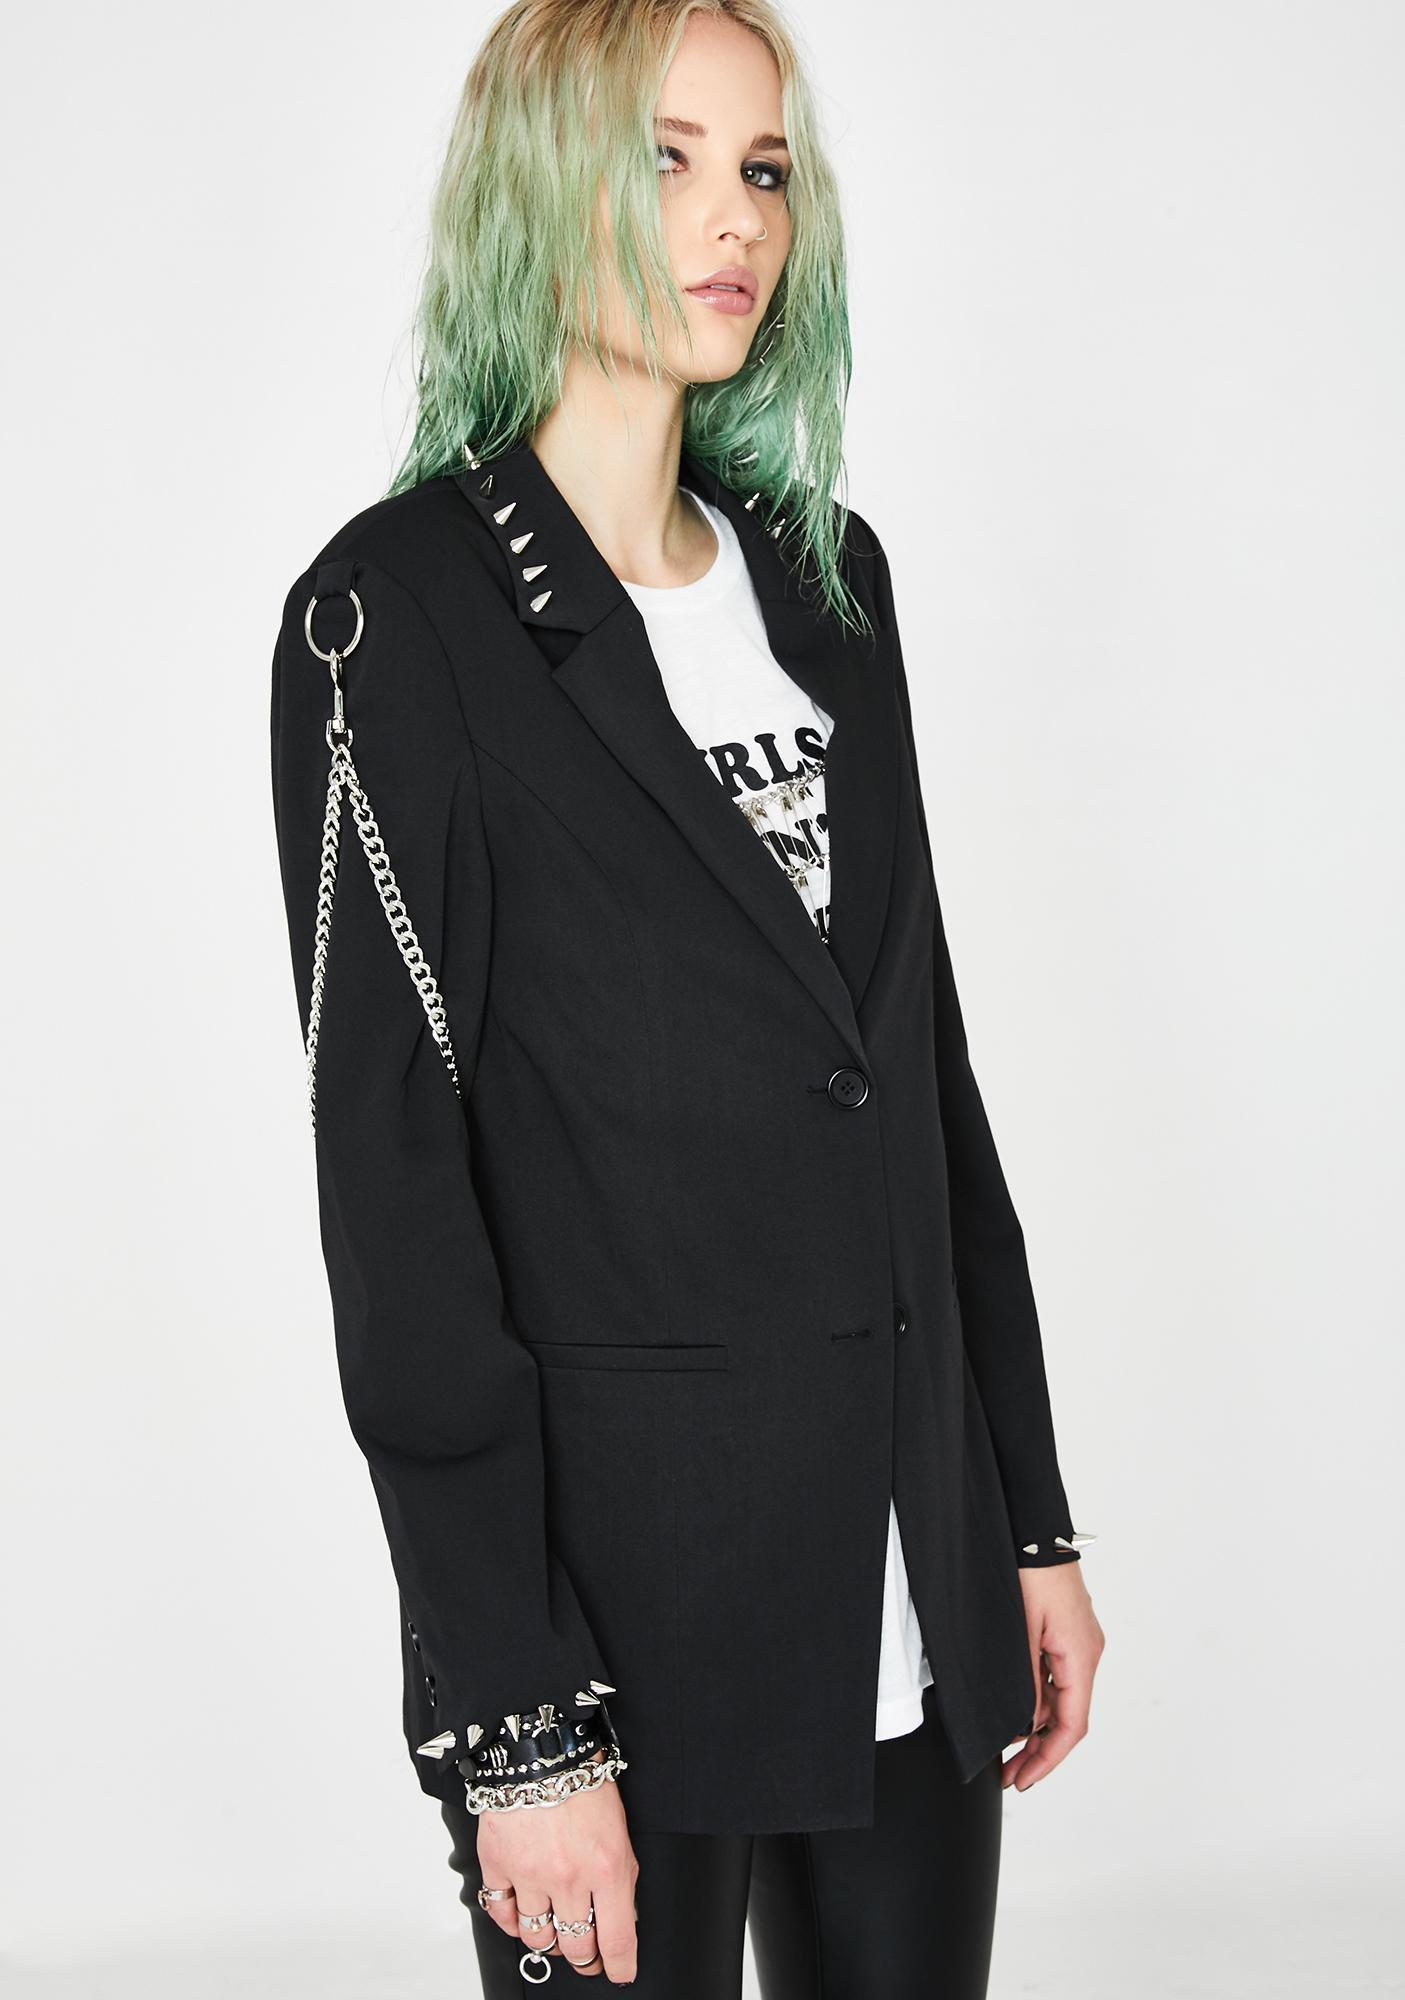 Current Mood Professional Outcast Studded Blazer